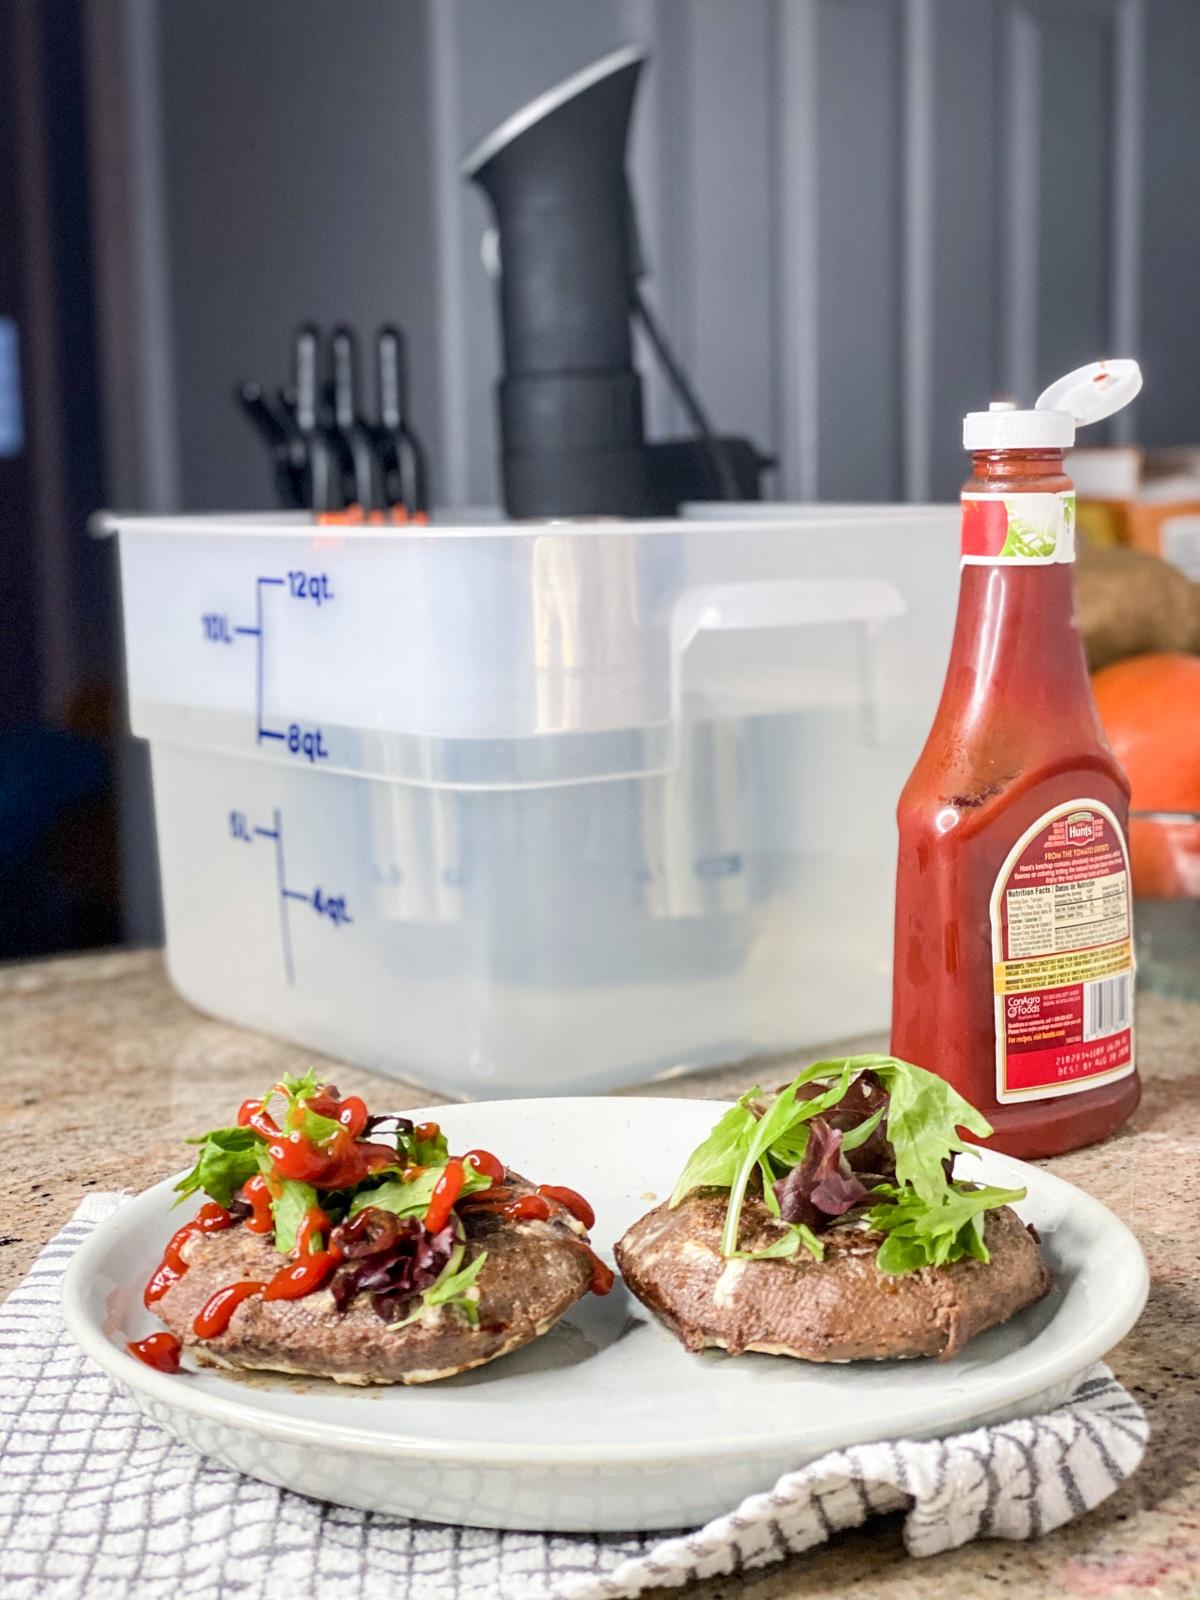 sous vide burger with anova sous vide machine